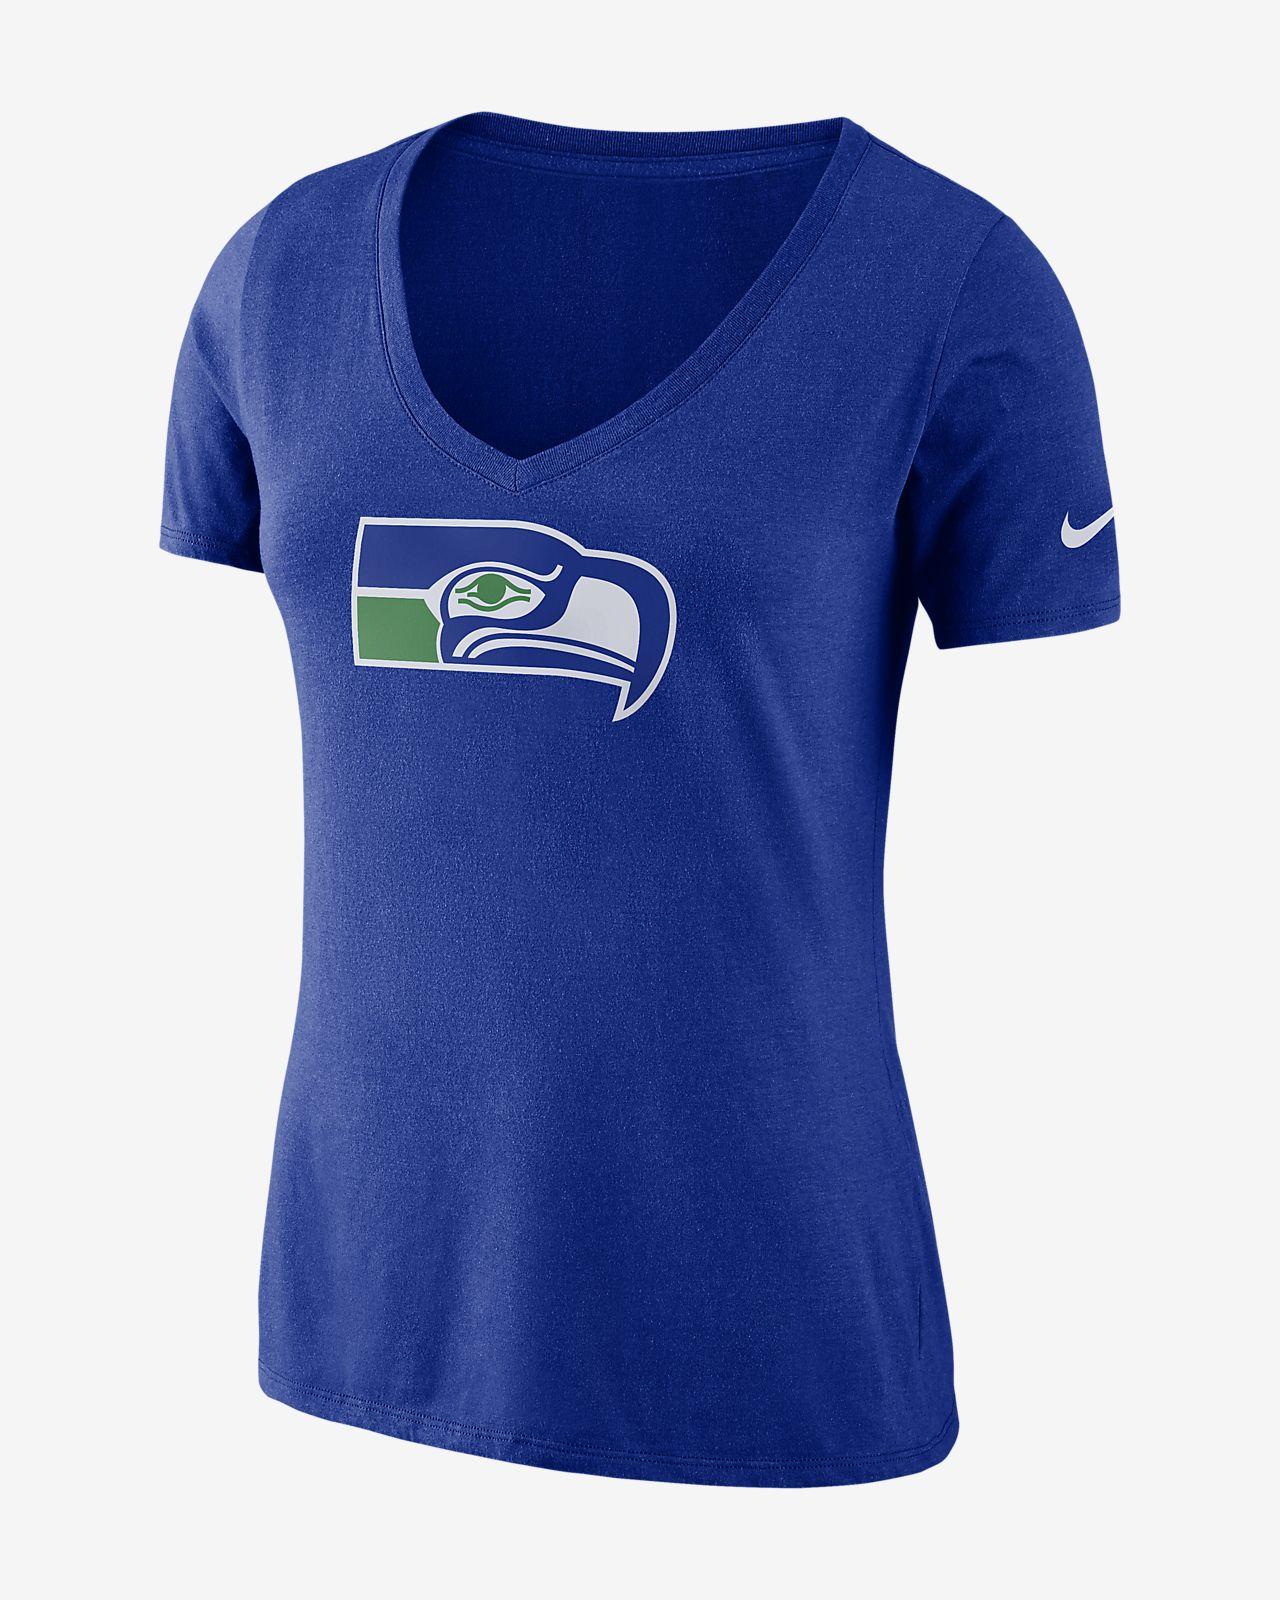 Nike Historic (NFL Seahawks) Women's T-Shirt